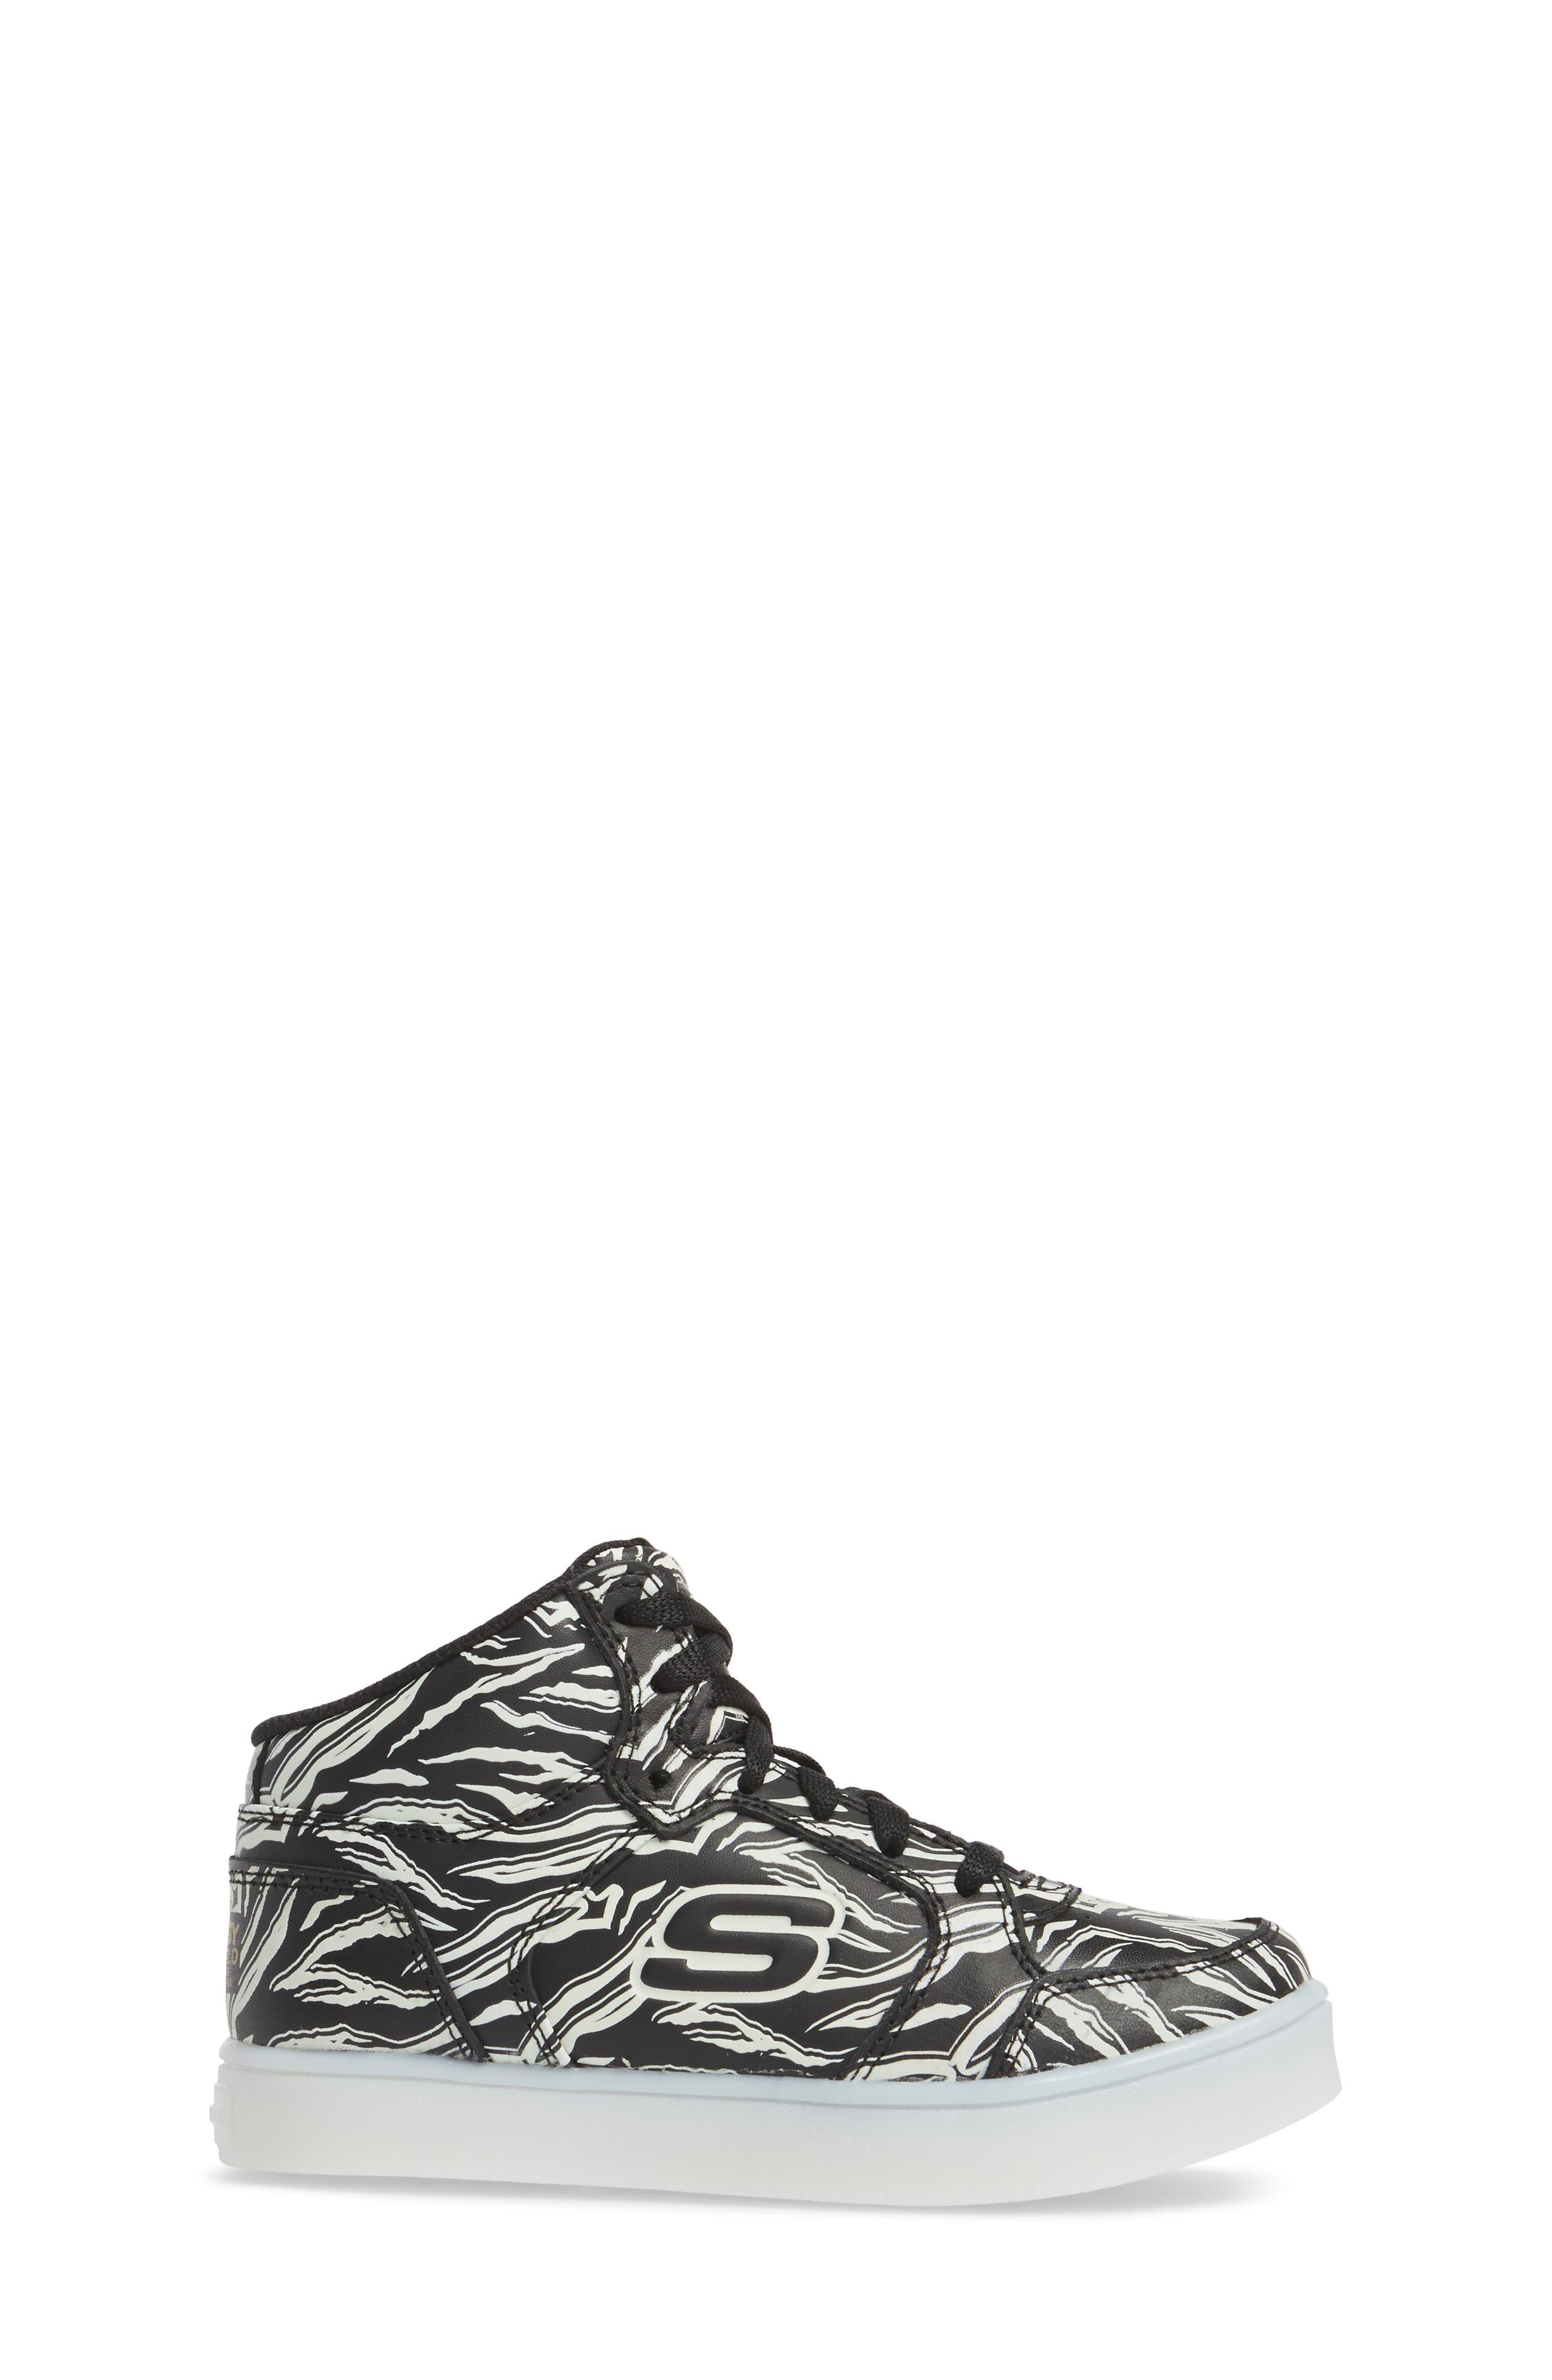 Energy Lights Glow in the Dark Sneaker,                             Alternate thumbnail 6, color,                             Black